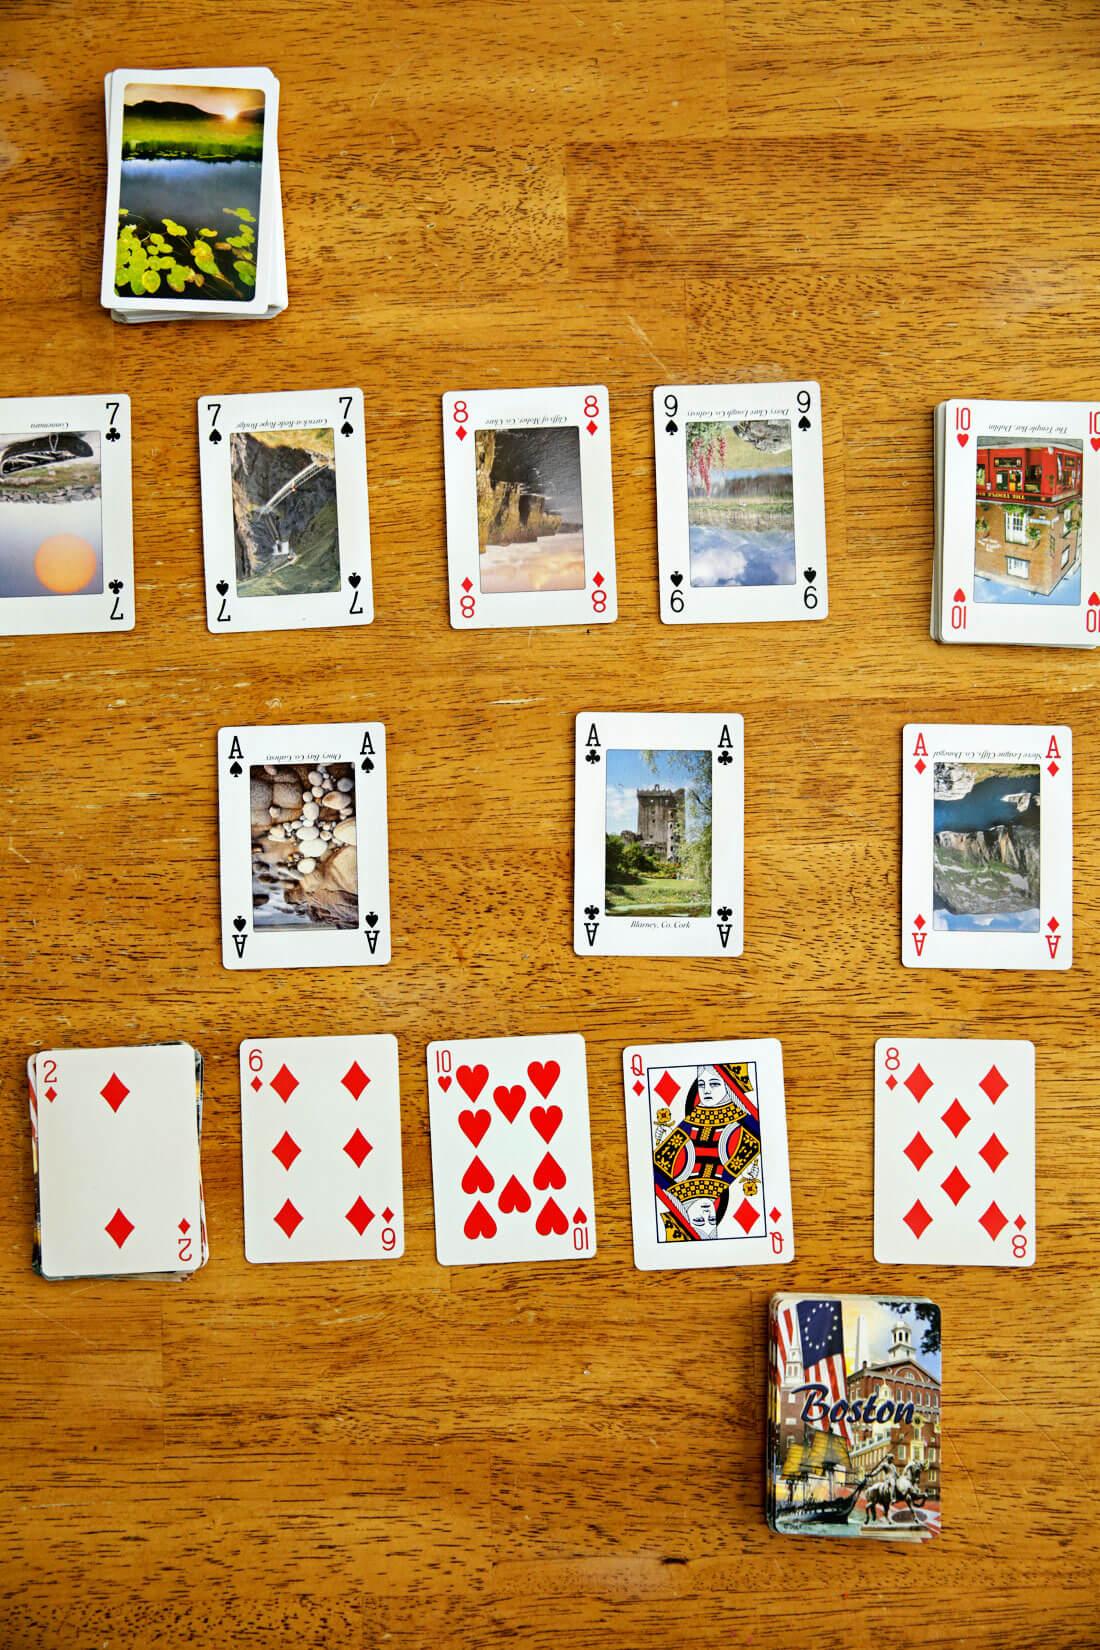 2 player card games - Nerts set up